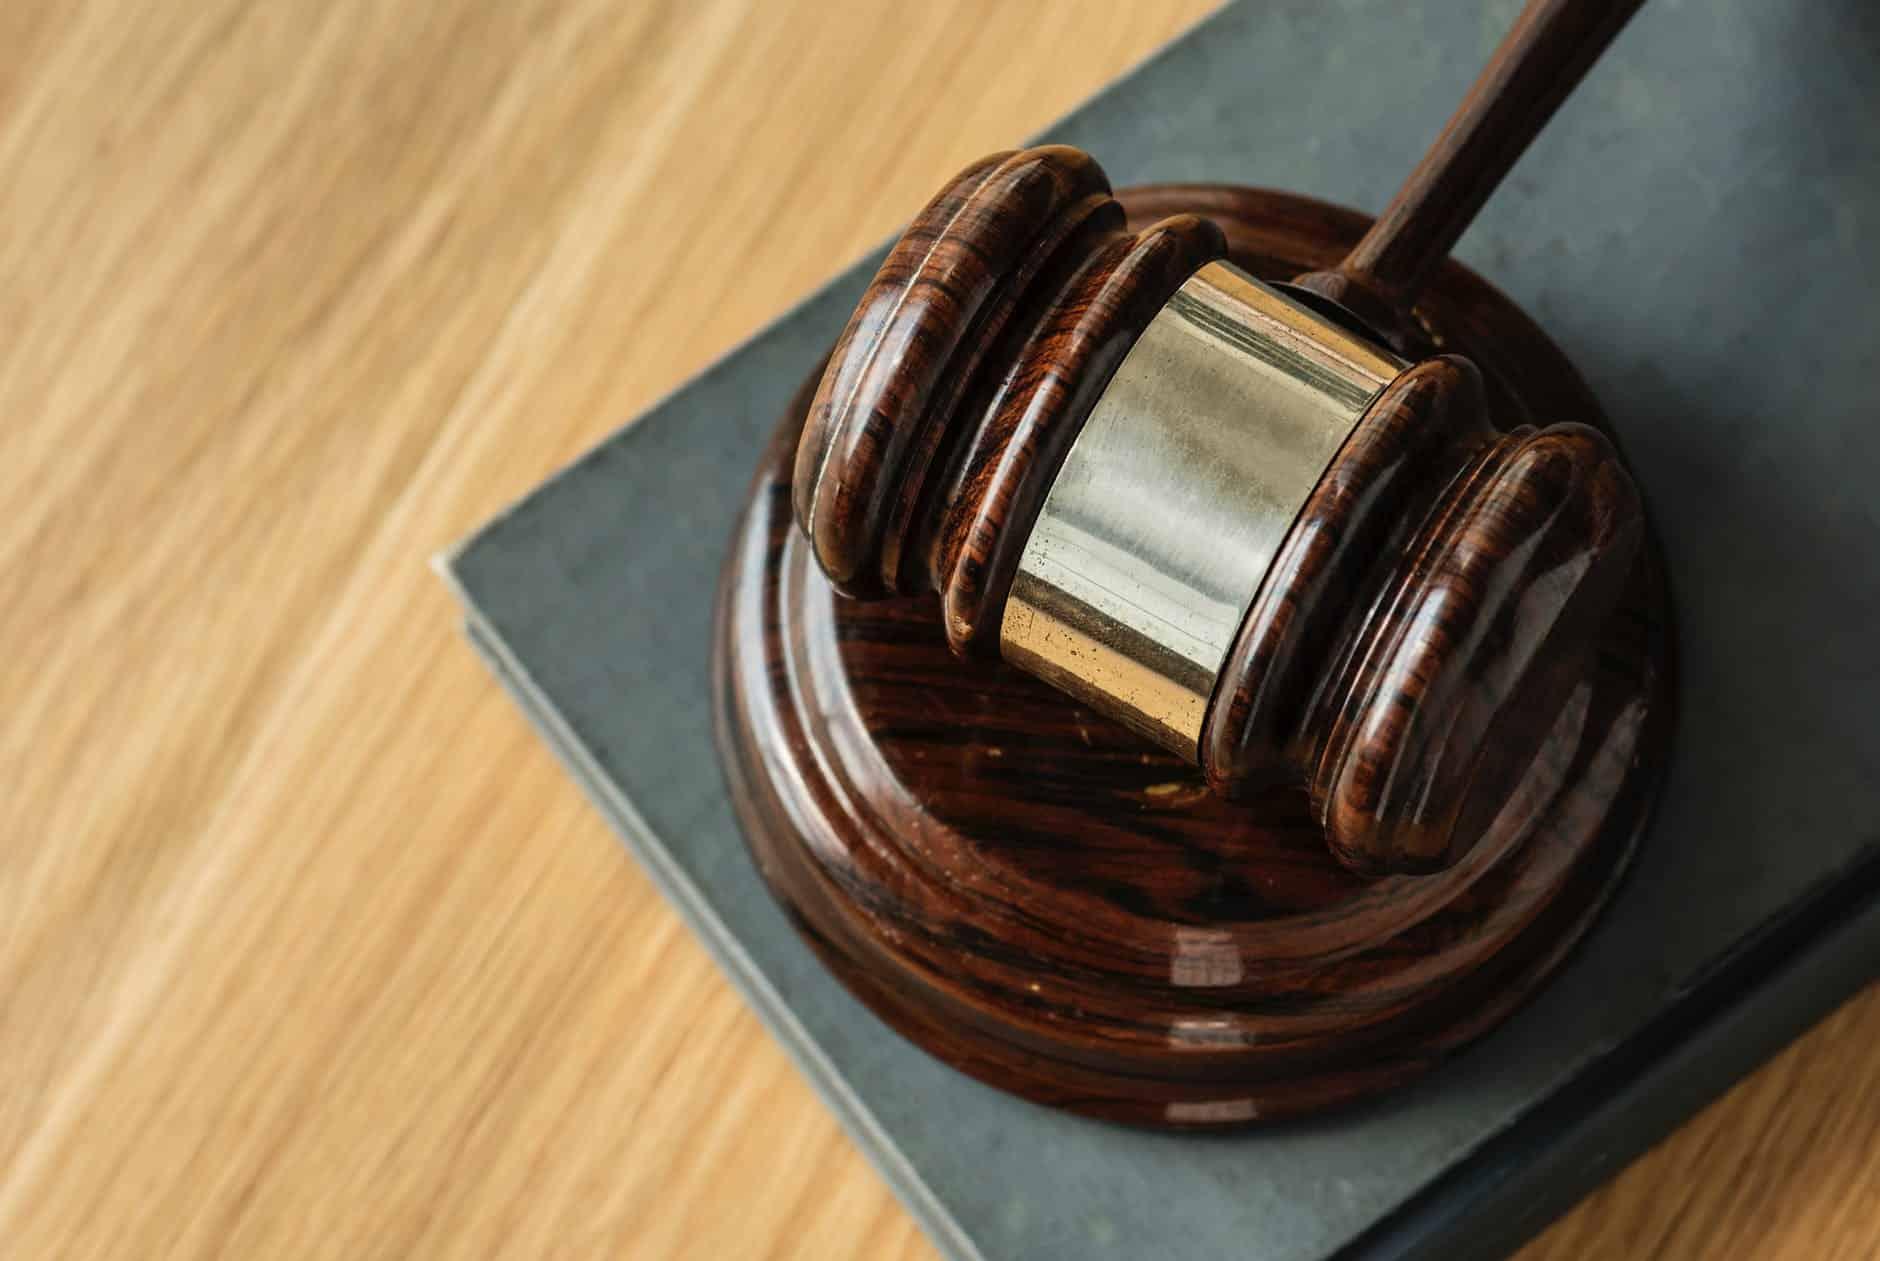 juge au tribunal maillet